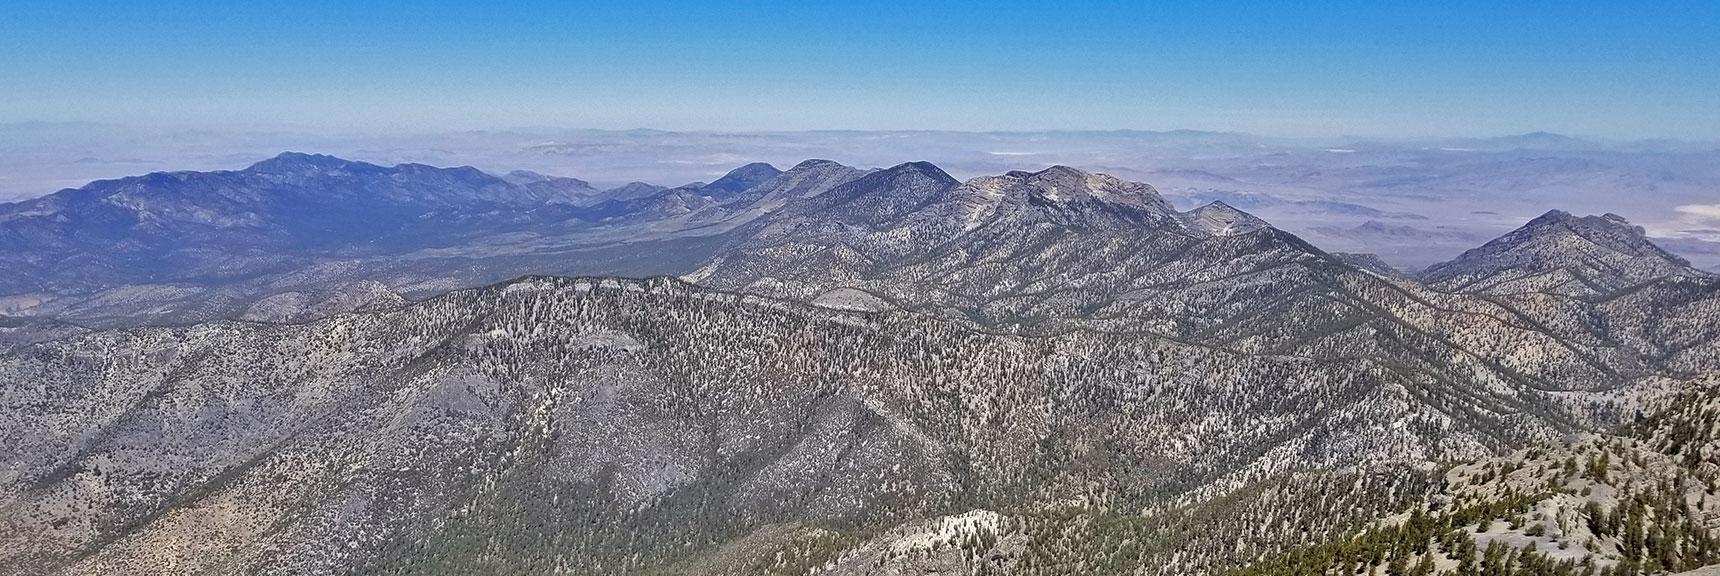 View West of Charleston Peak from the Summit | Griffith Peak & Charleston Peak Circuit Run, Spring Mountains, Nevada